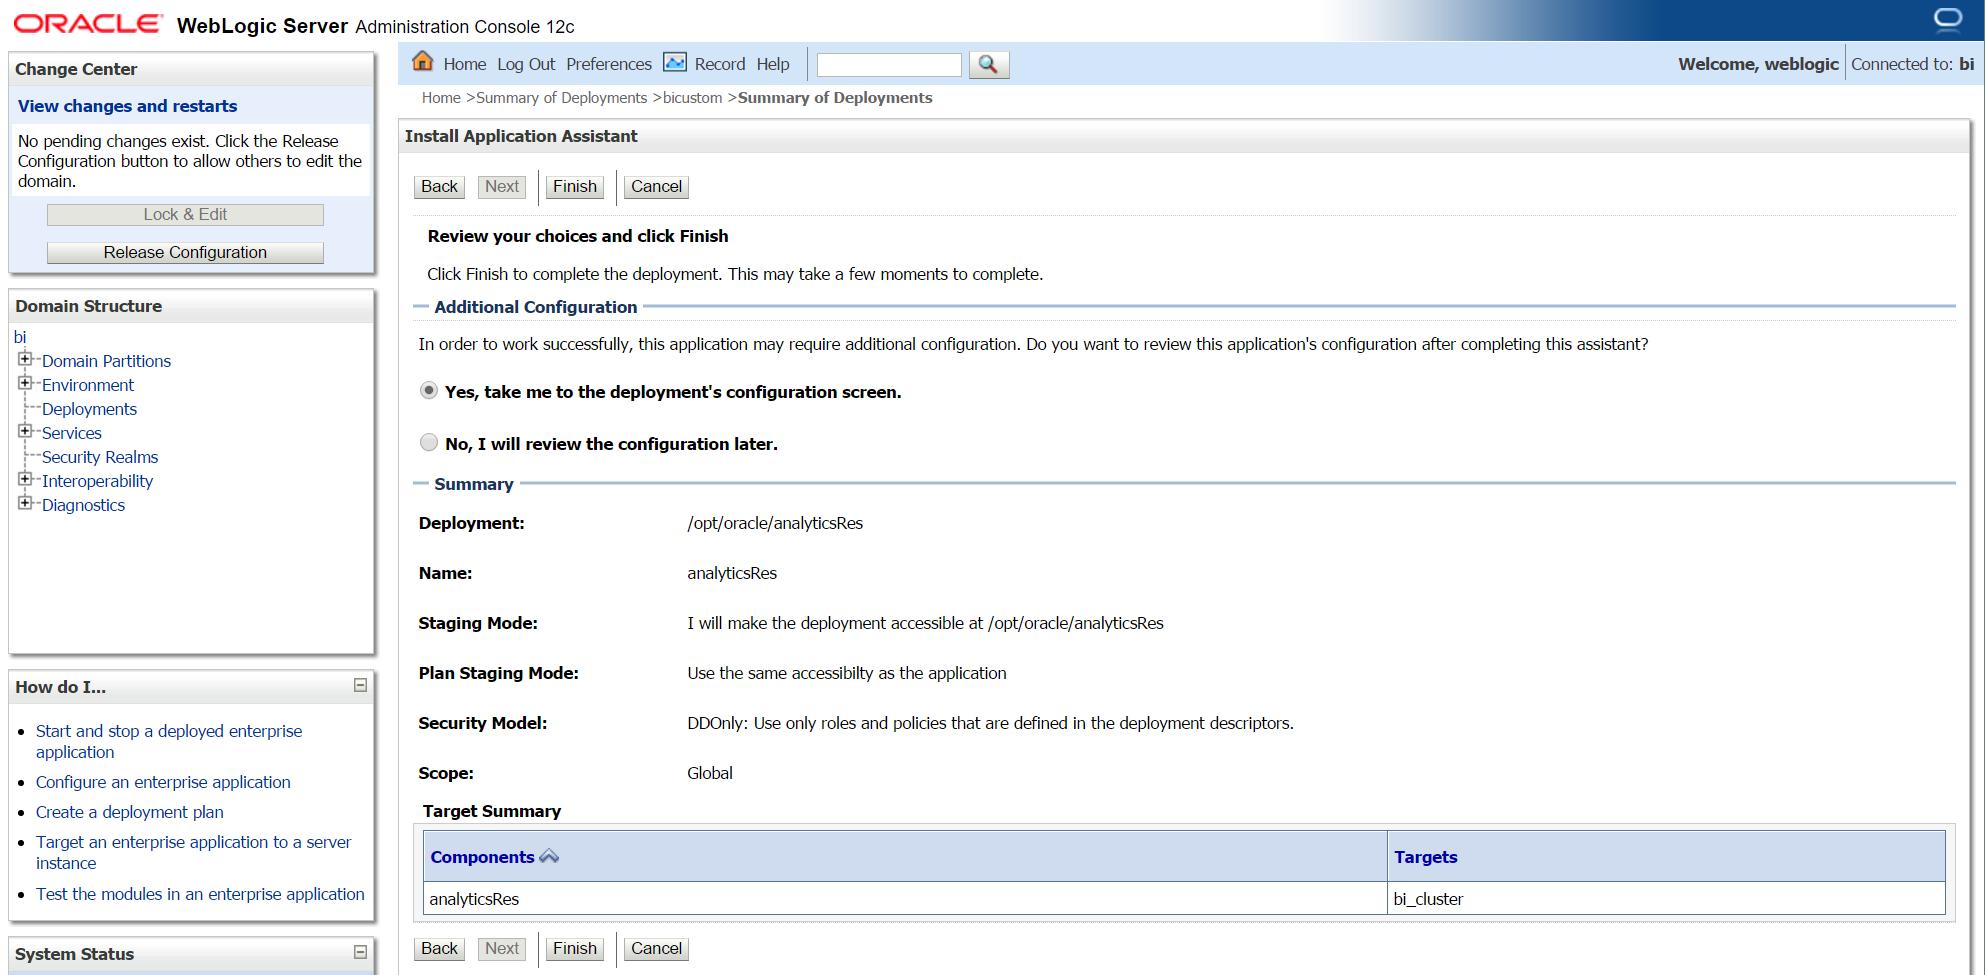 OBIEE 12c Custom Style using shared folder (analyticsRes